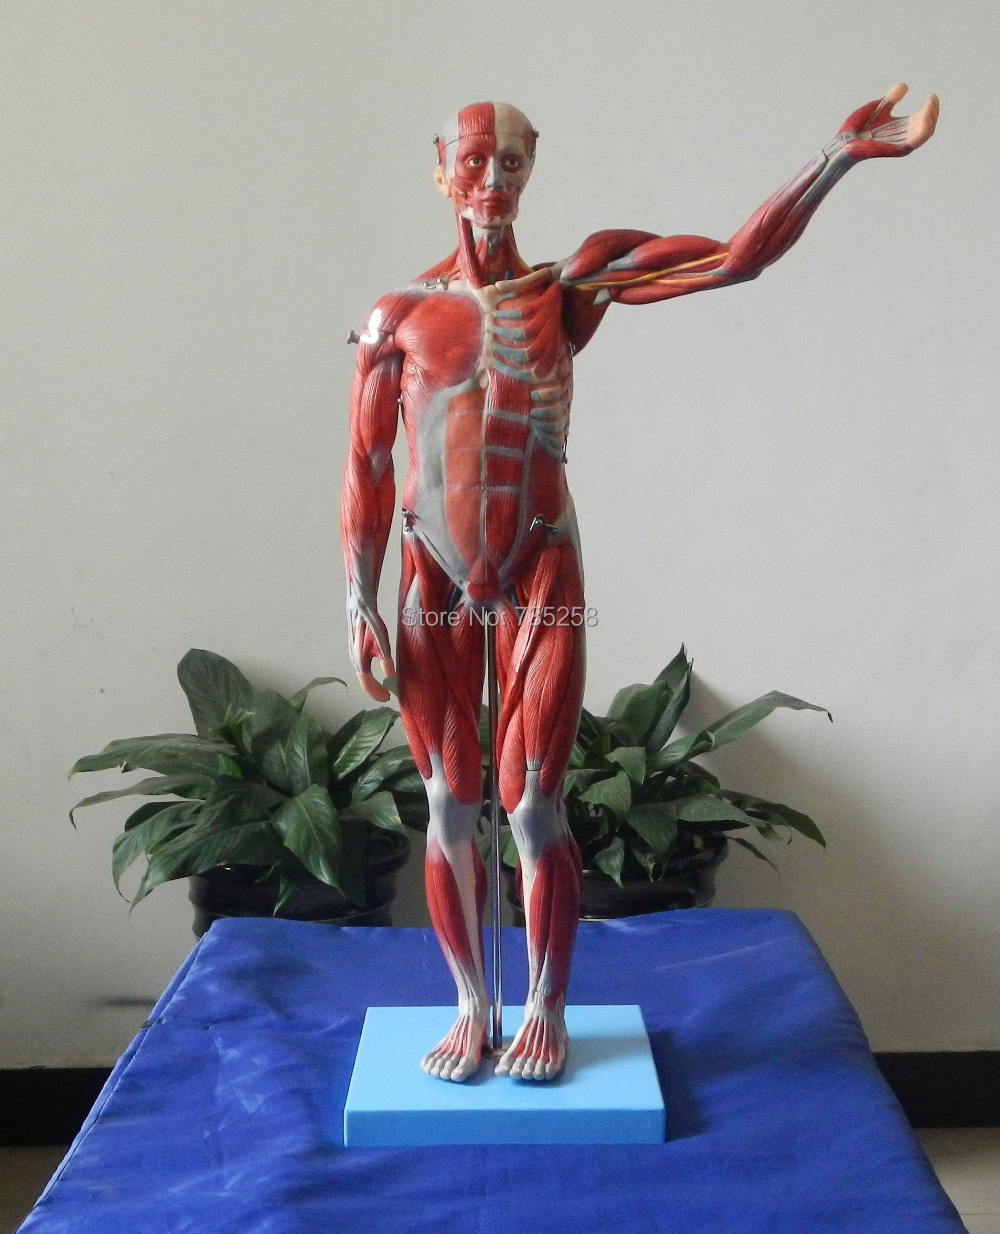 ISO Zertifizierung Körper Muskeln Anatomisches Modell, 78 cm ...